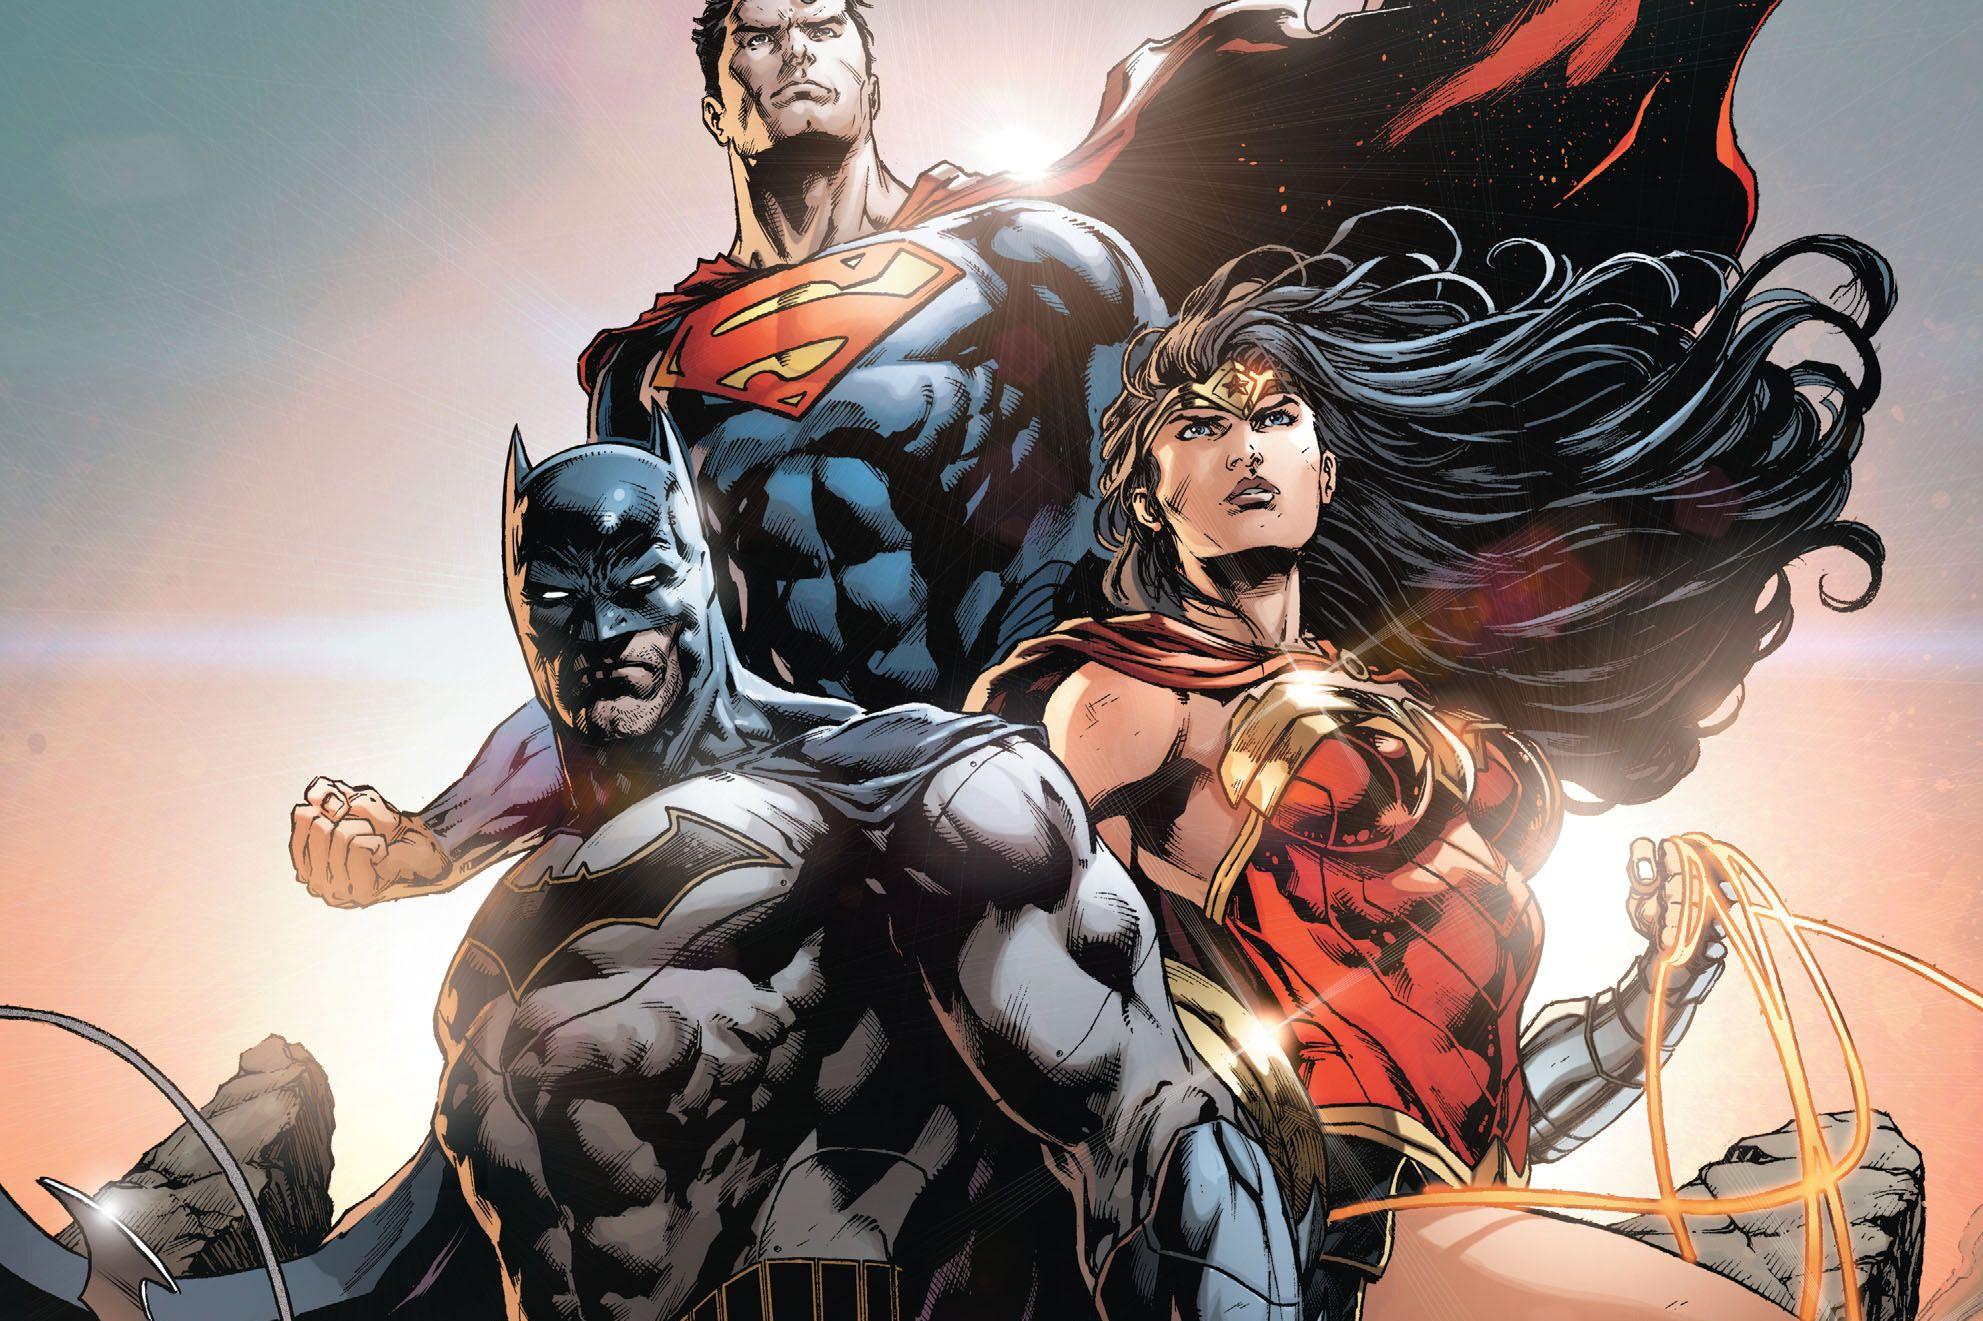 1280x1024 Wonder Woman Movie 1280x1024 Resolution Hd 4k: Superman Batman Wonder Woman Artwork, HD Superheroes, 4k